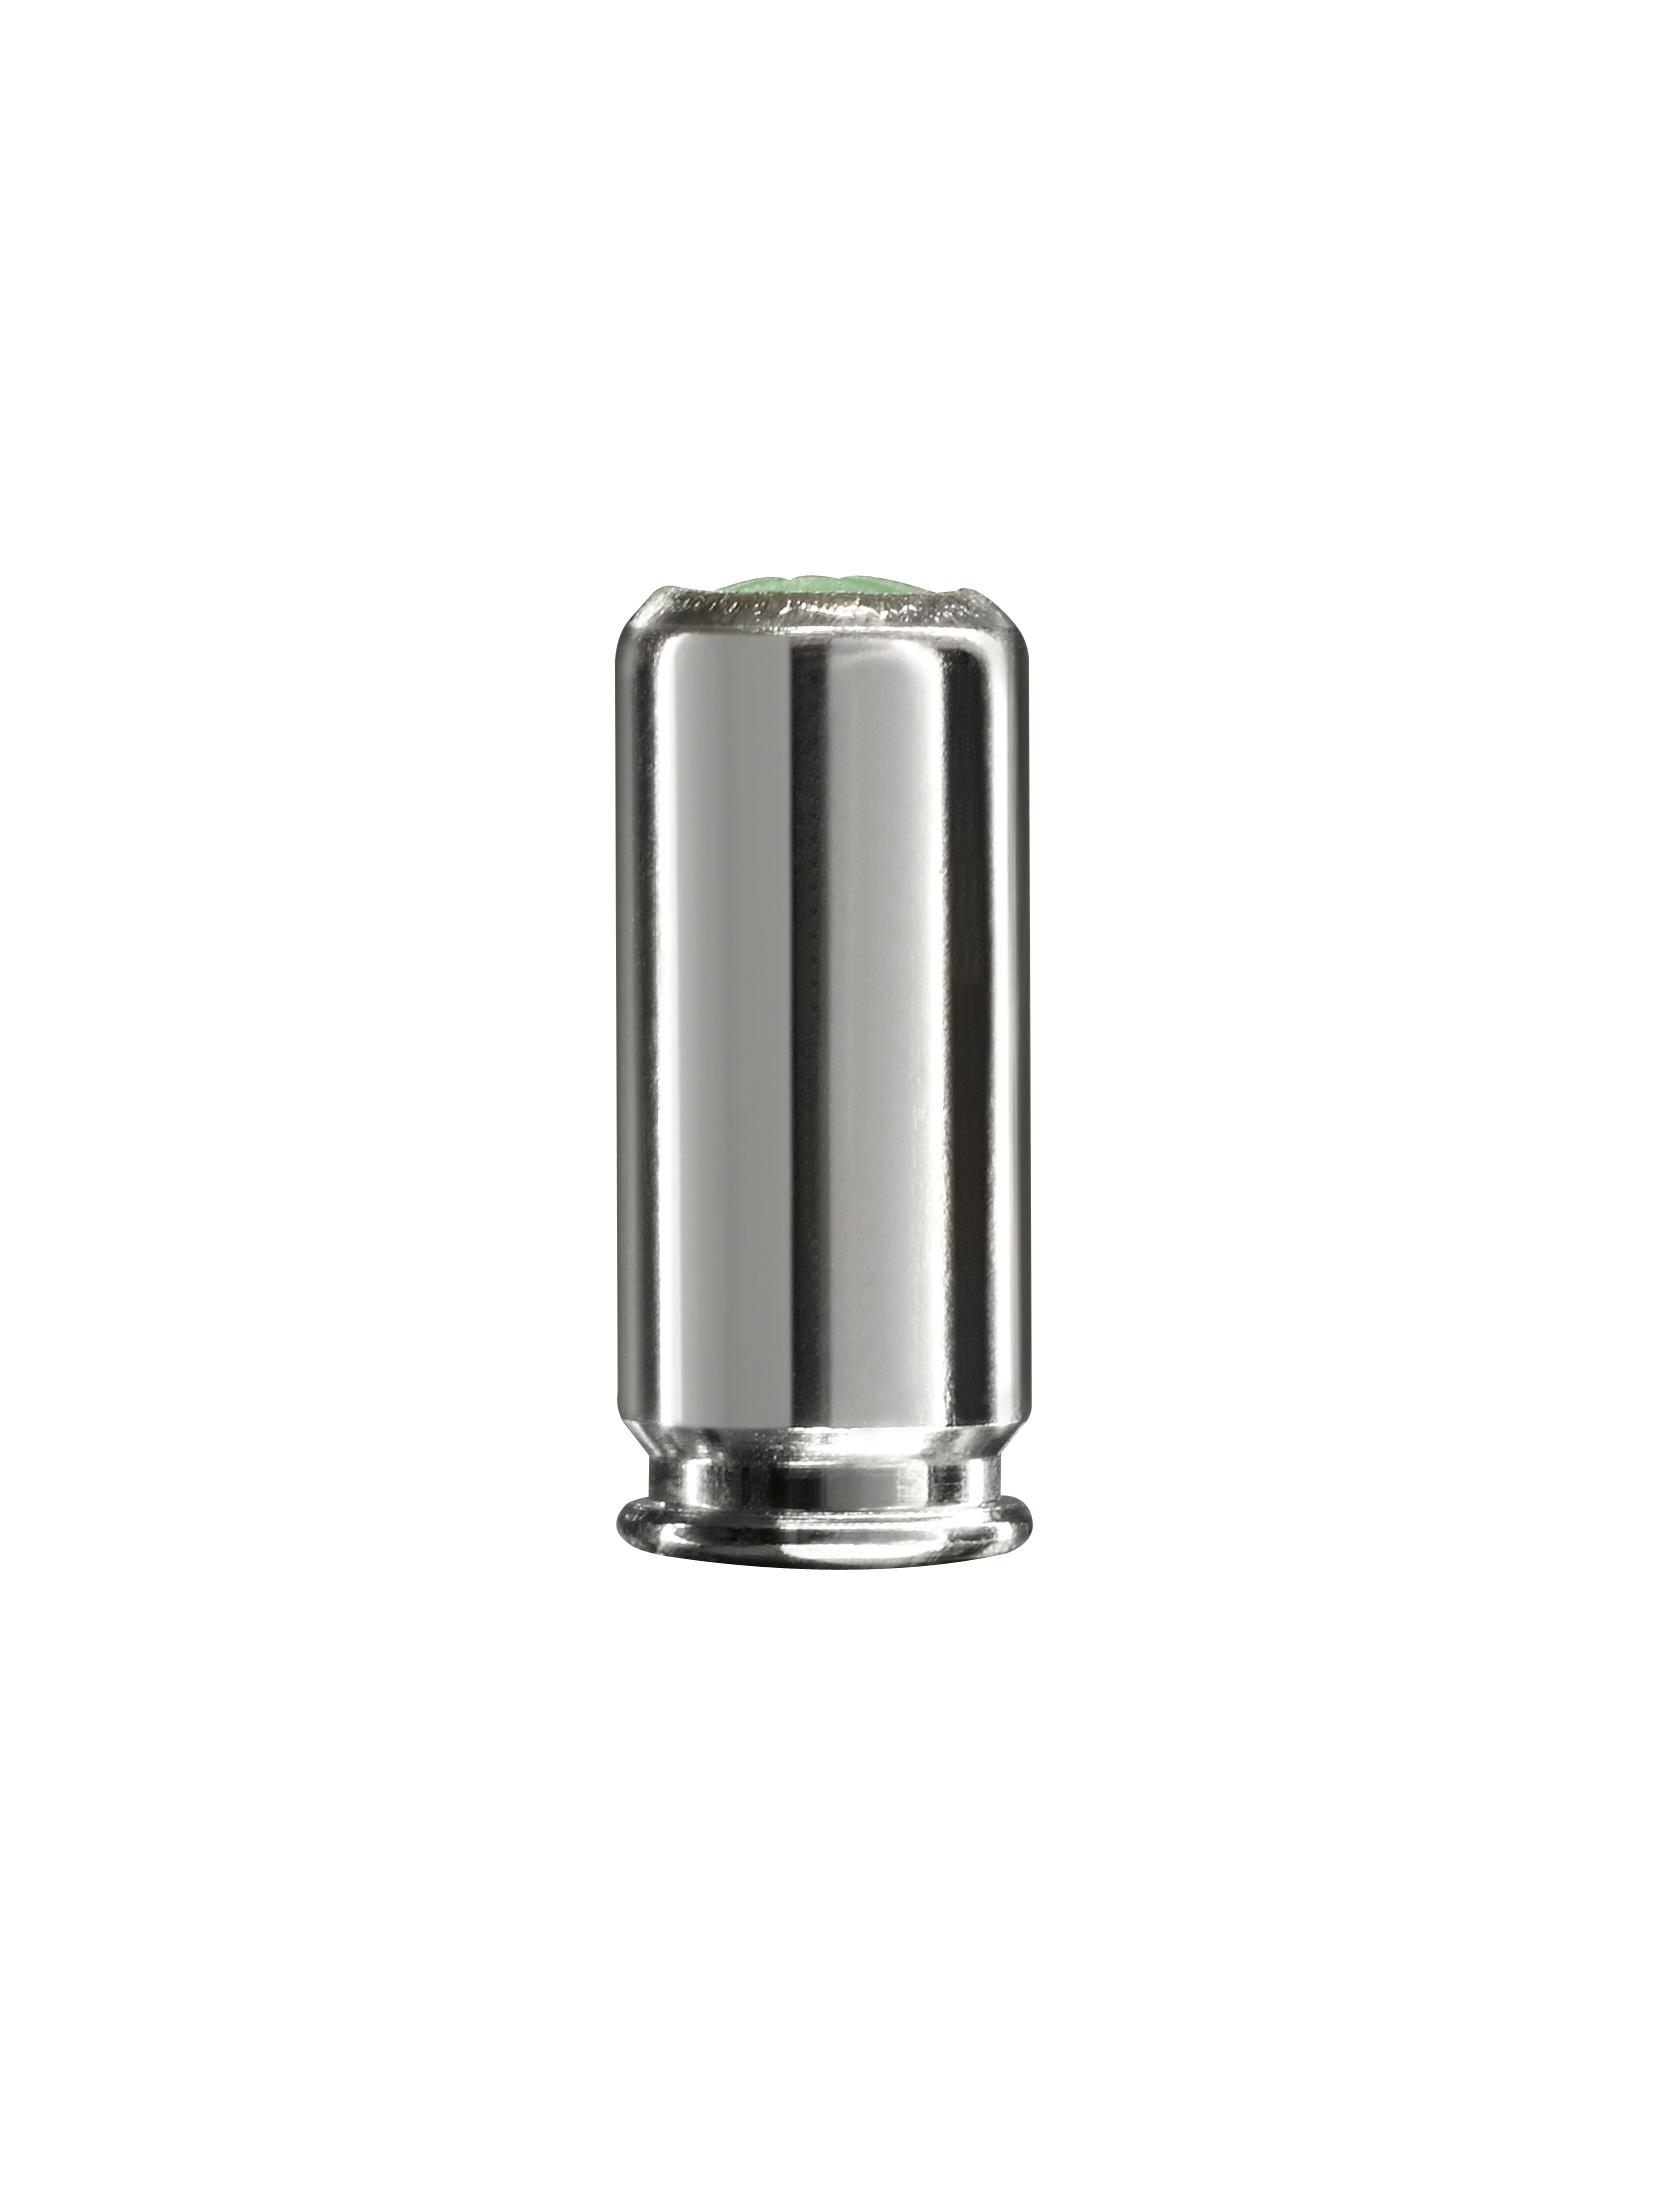 Perfekta Titan Platzpatrone 9mm P.A.K., 50 Schuss